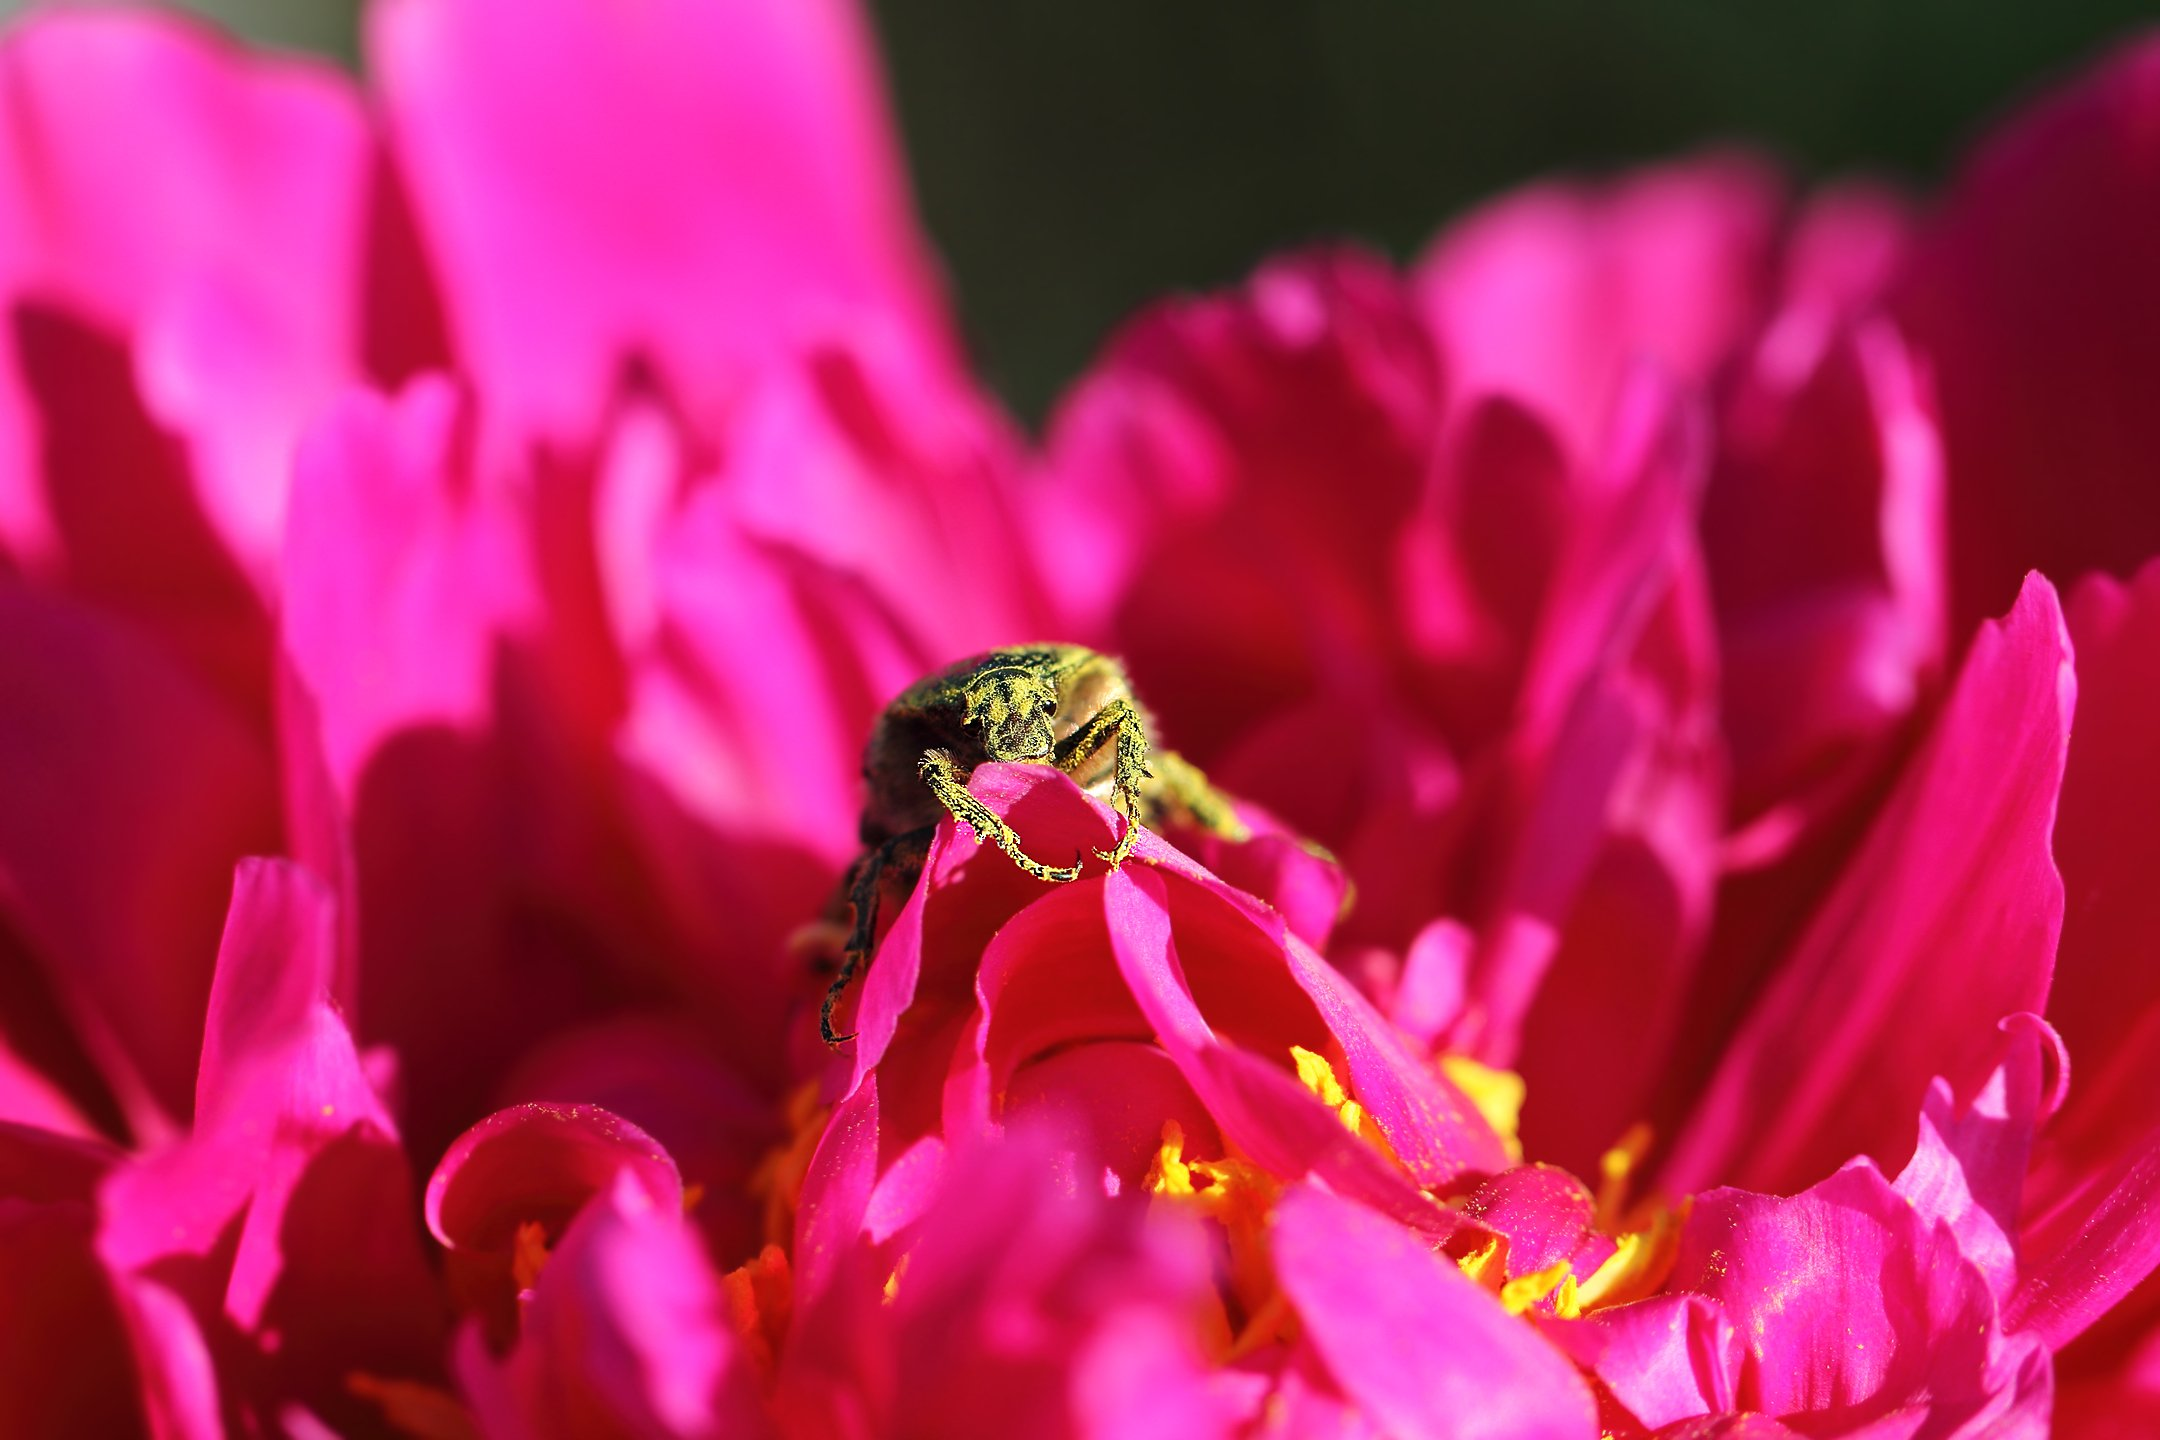 бронзовки, букашка, насекомое, насекомые, жучок, жуки, жучки, bugs, insects, cetoniinae, Салтыков Дмитрий